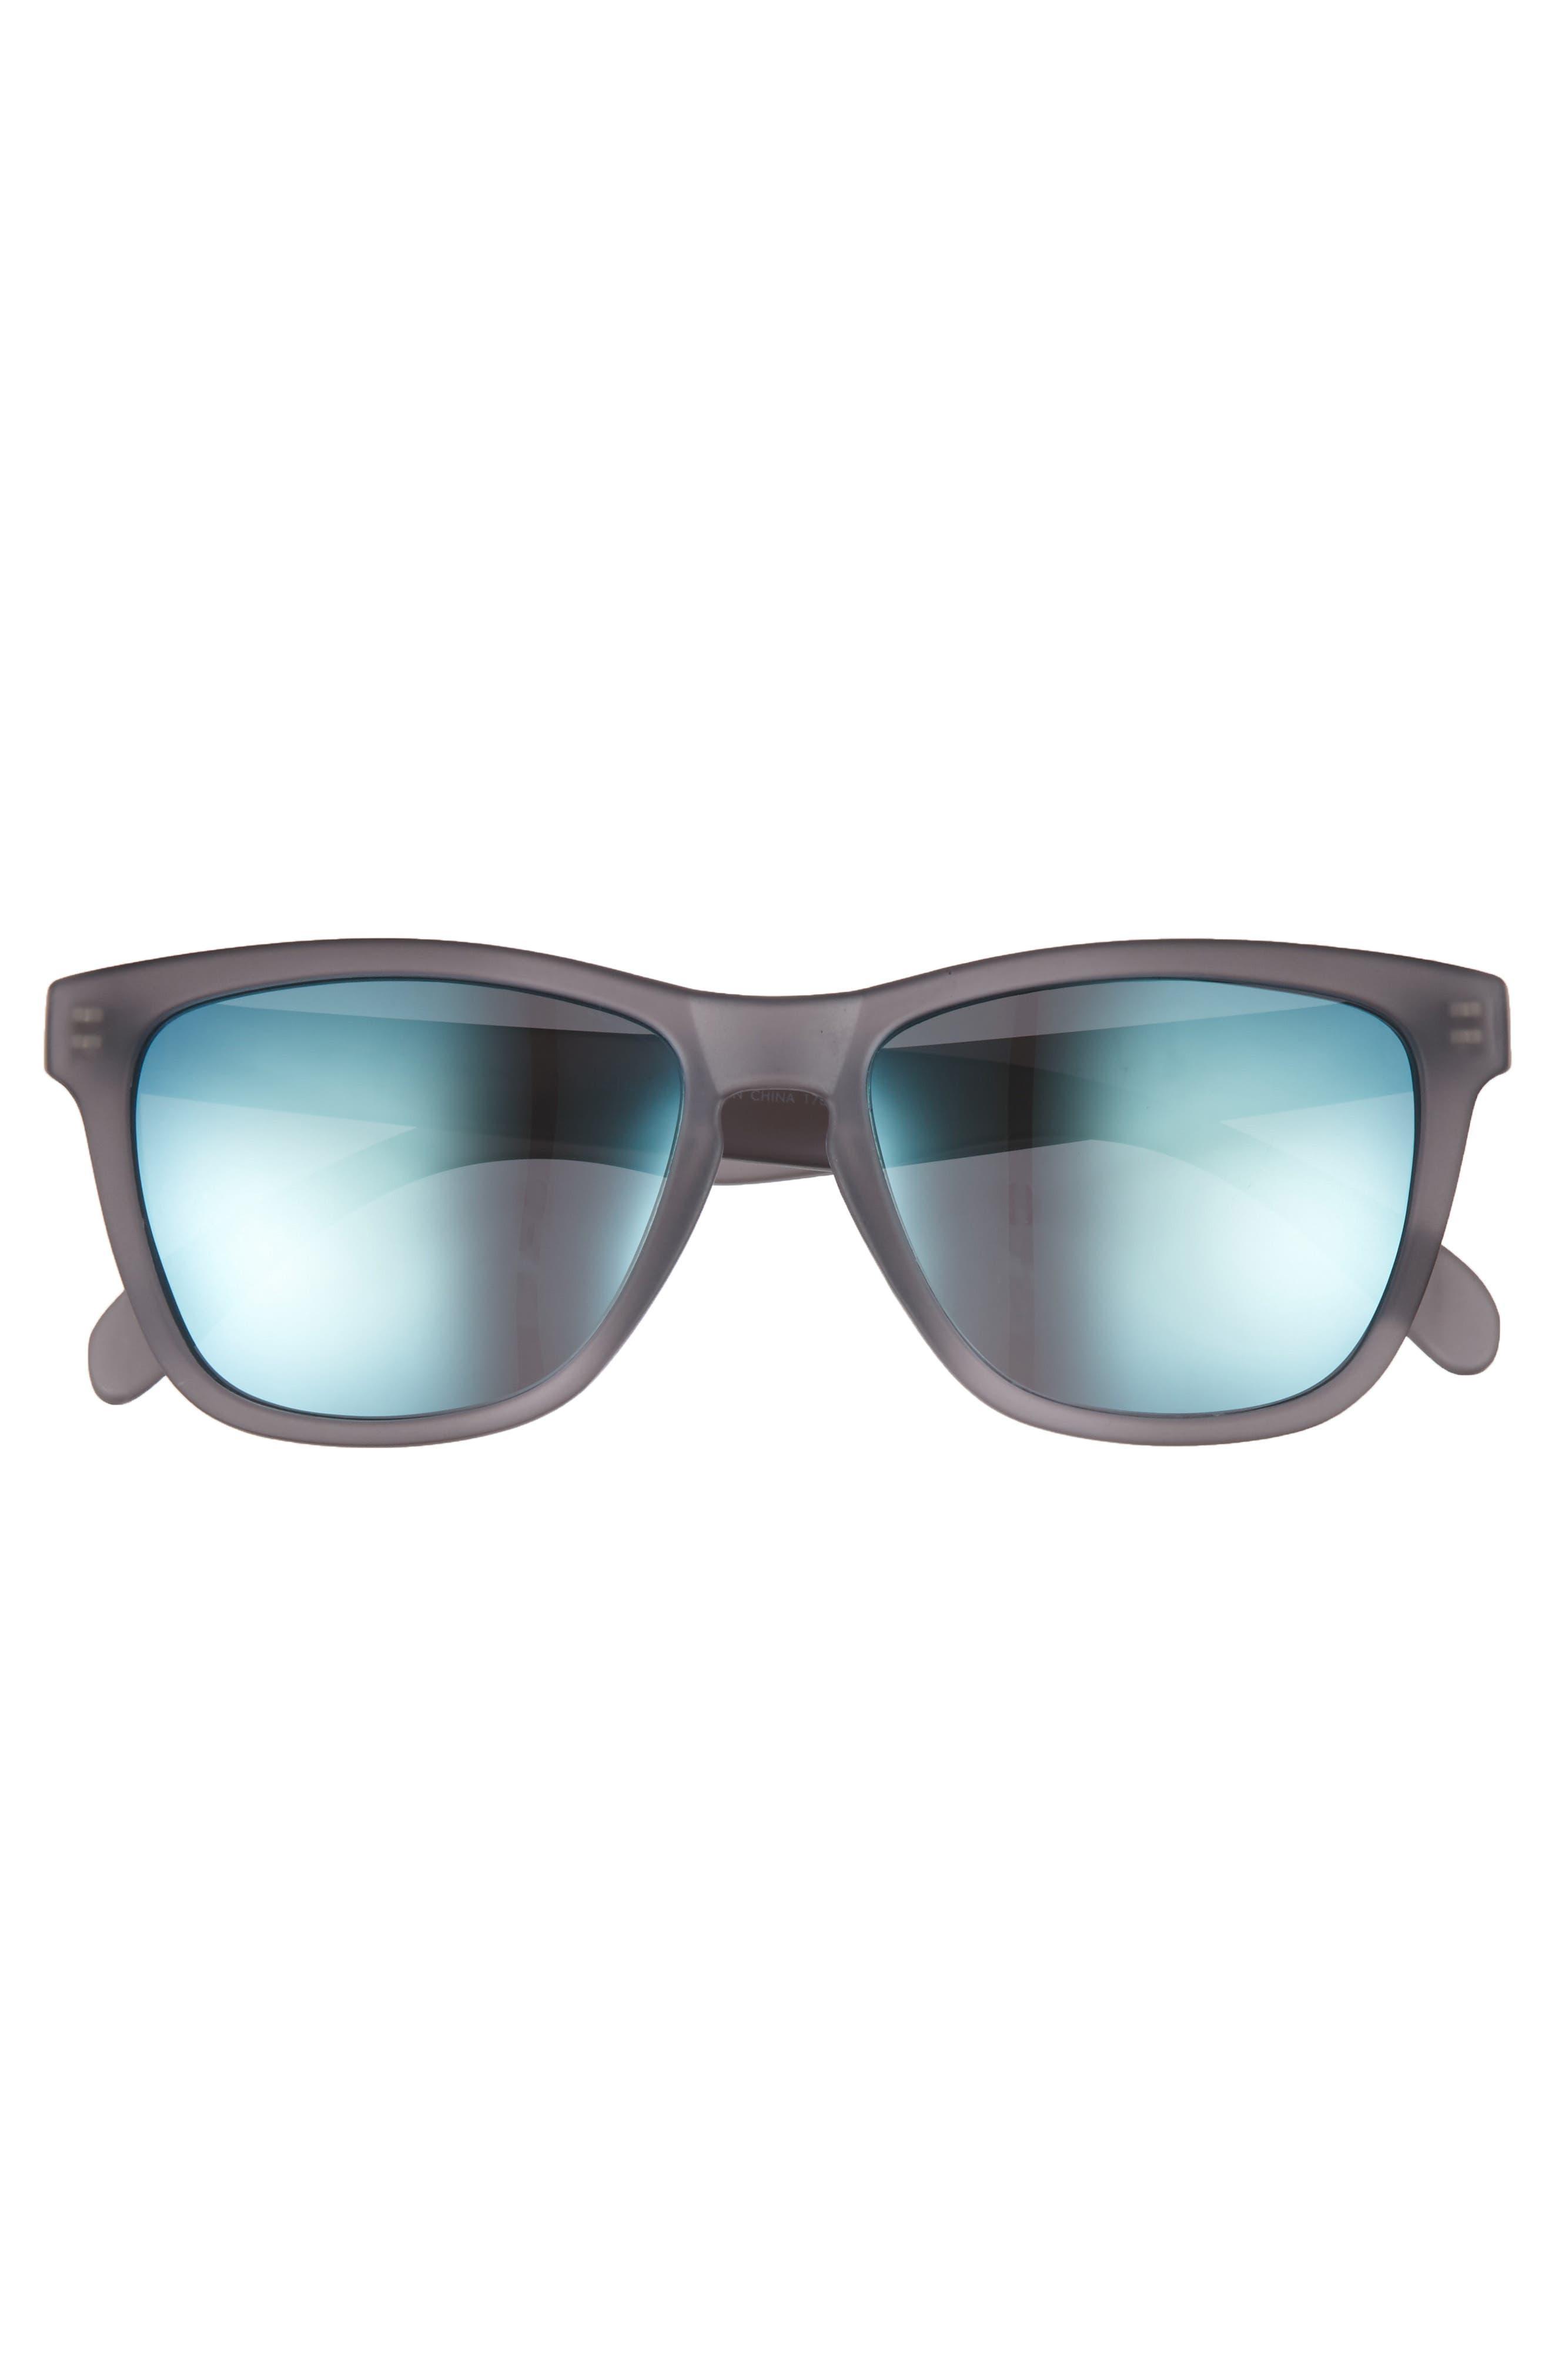 Alternate Image 2  - Sunski Headlands 53mm Polarized Sunglasses